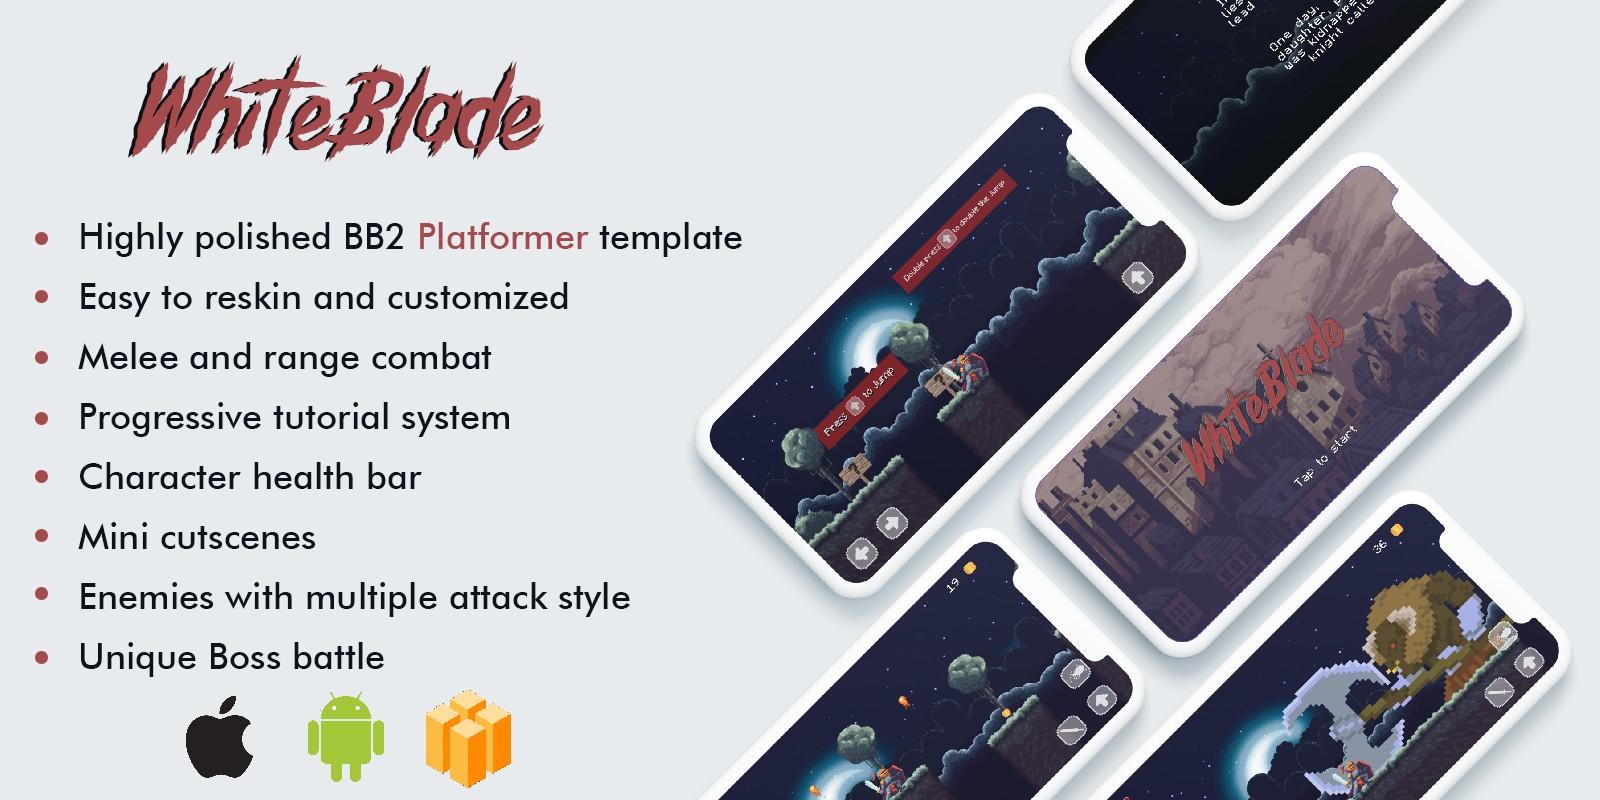 WhiteBlade - Buildbox 2 Platformer Template